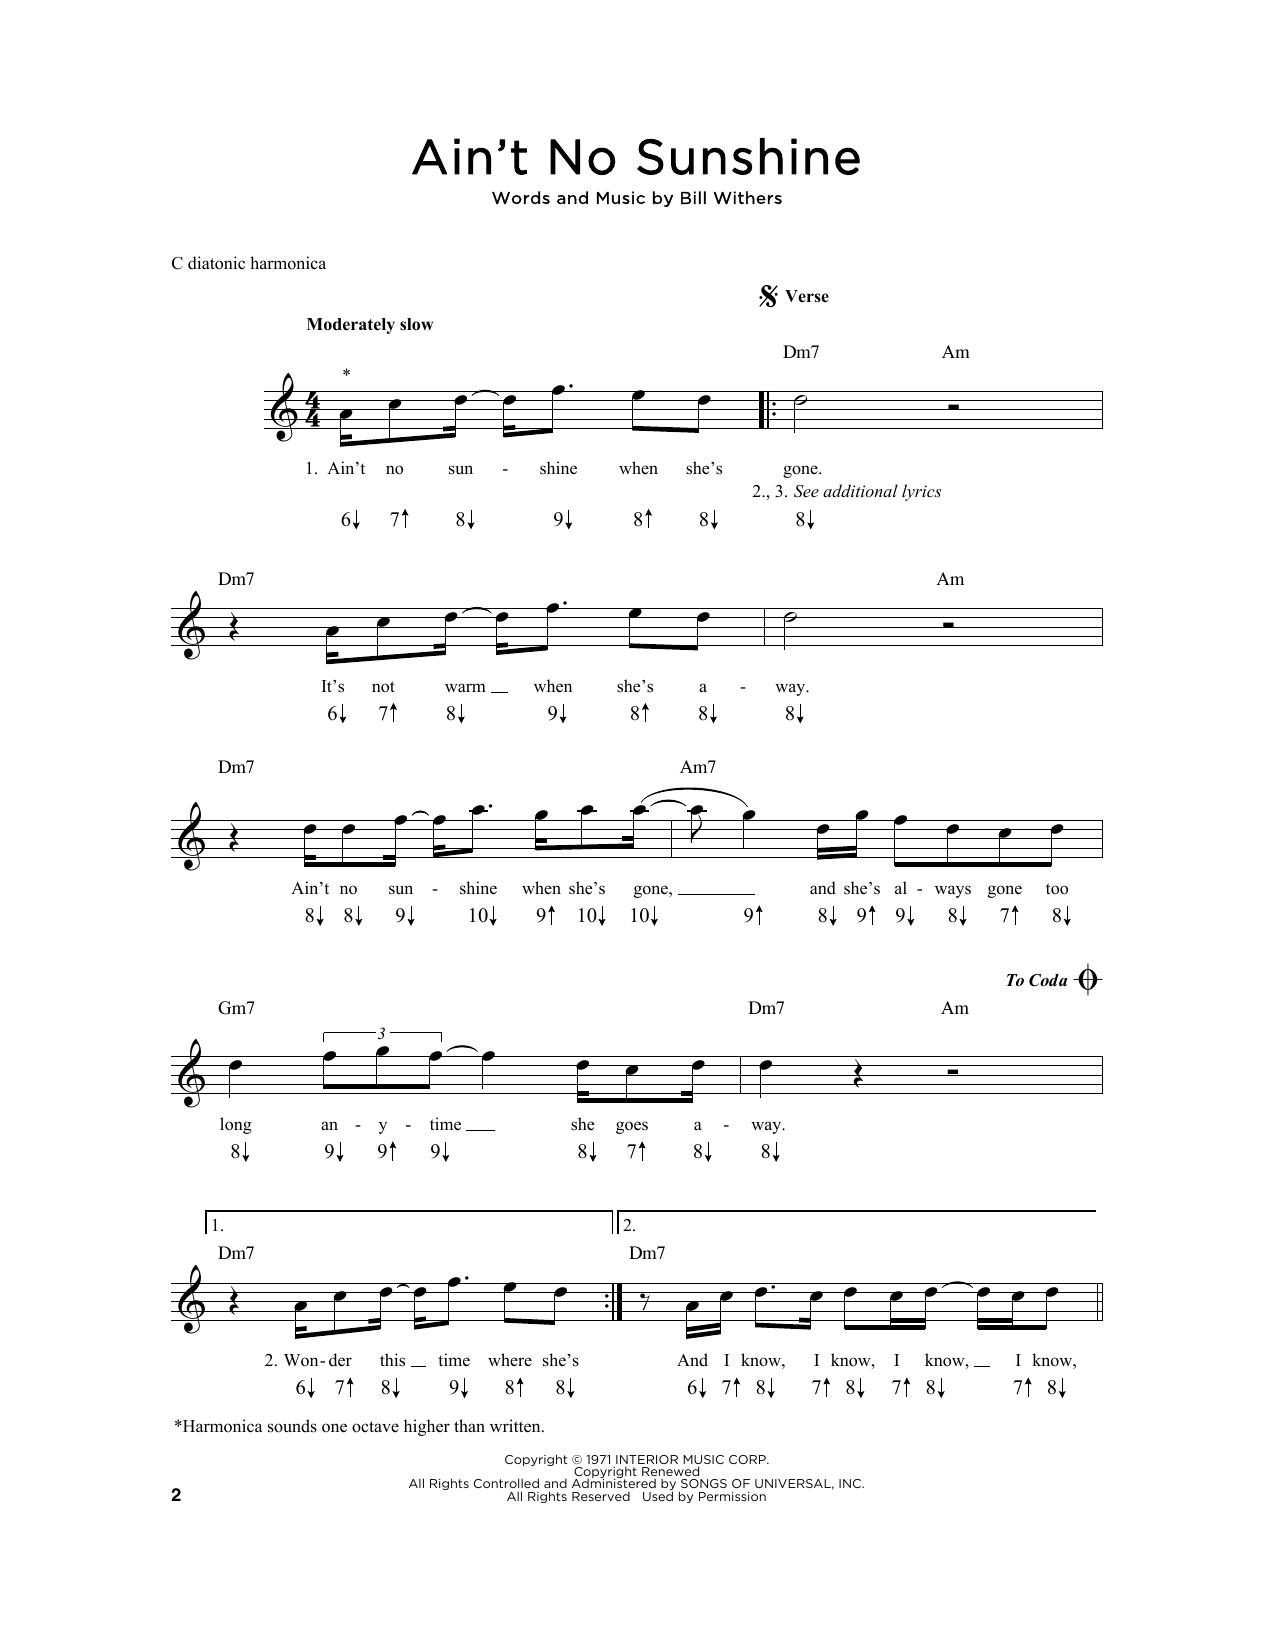 Ain T No Sunshine Sheet Music Bill Withers Harmonica Am em g am it's not warm when she's away. ain t no sunshine sheet music bill withers harmonica